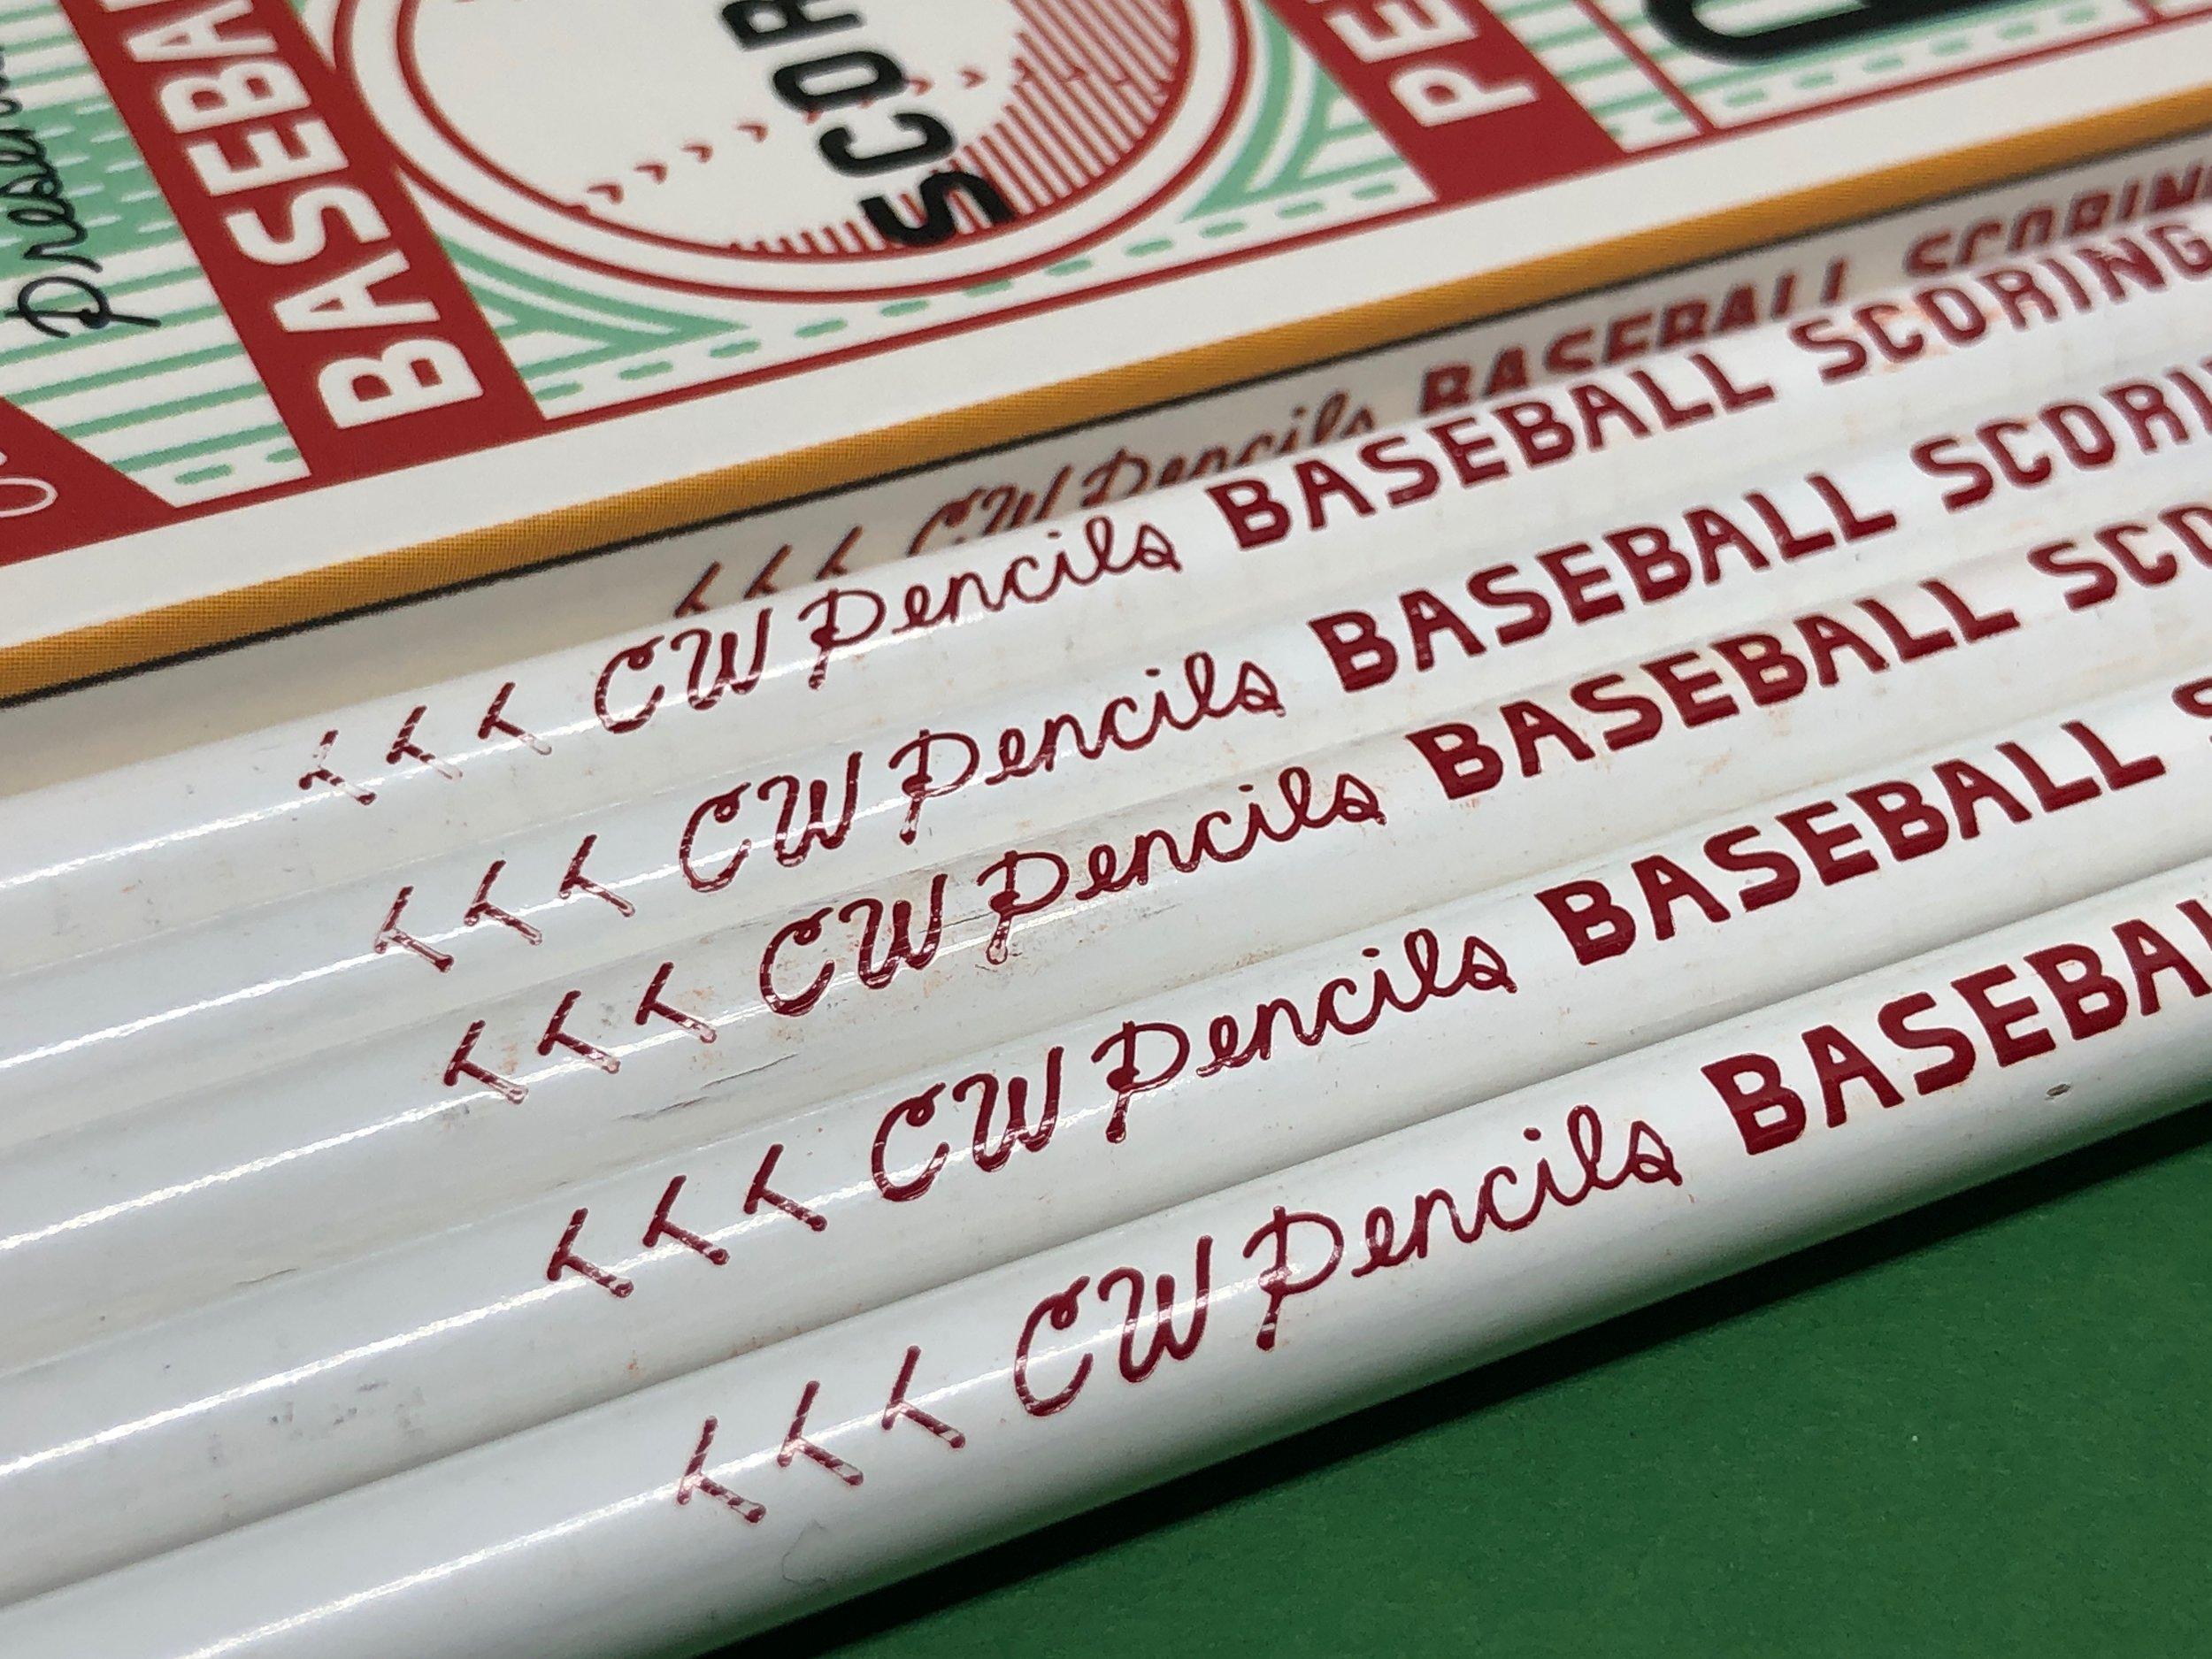 cwpe-generals-baseball-scoring-pencil-2.jpg